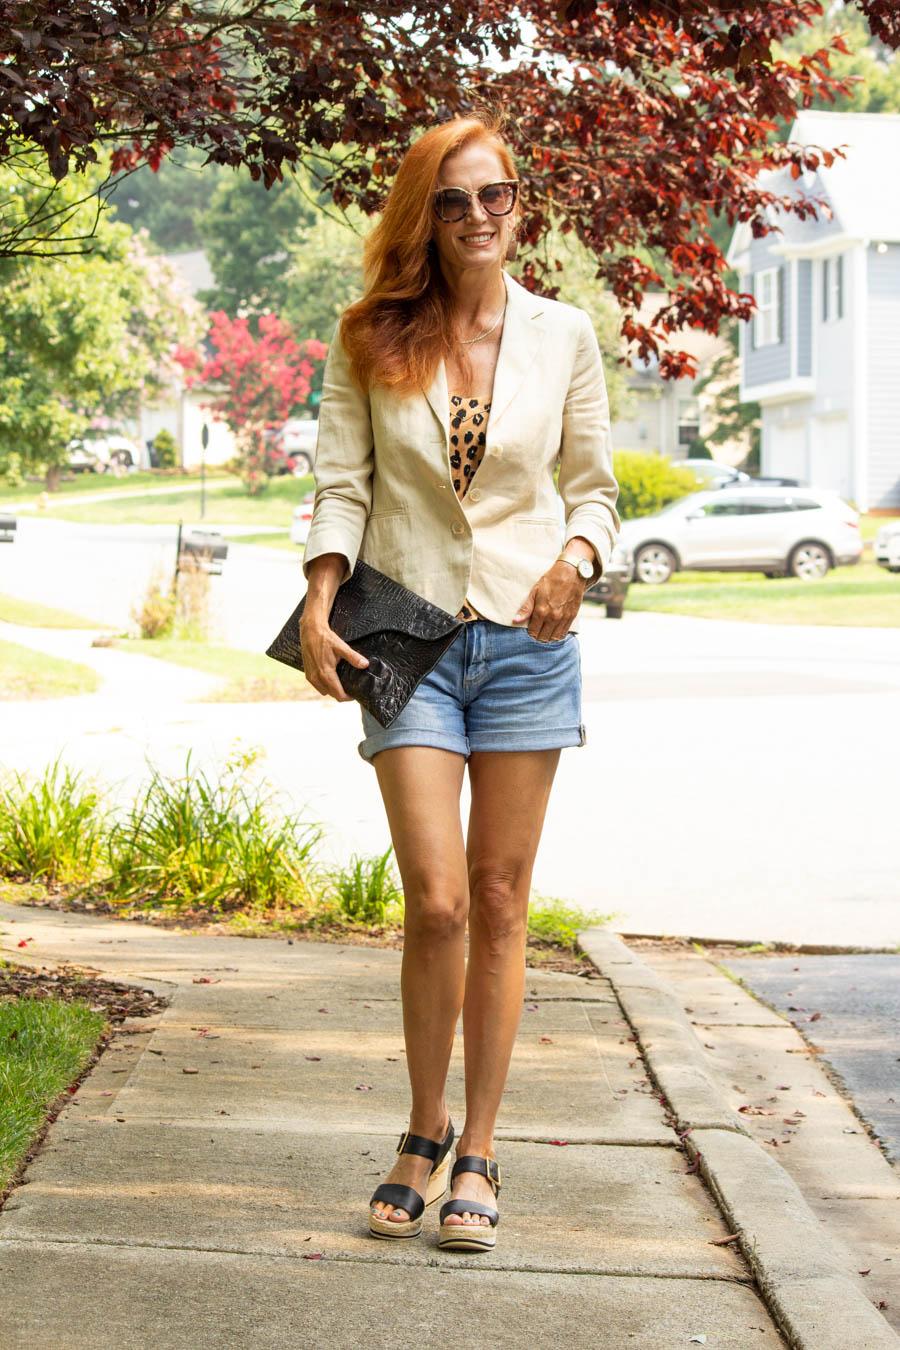 women's casual summer look wearing denim shorts